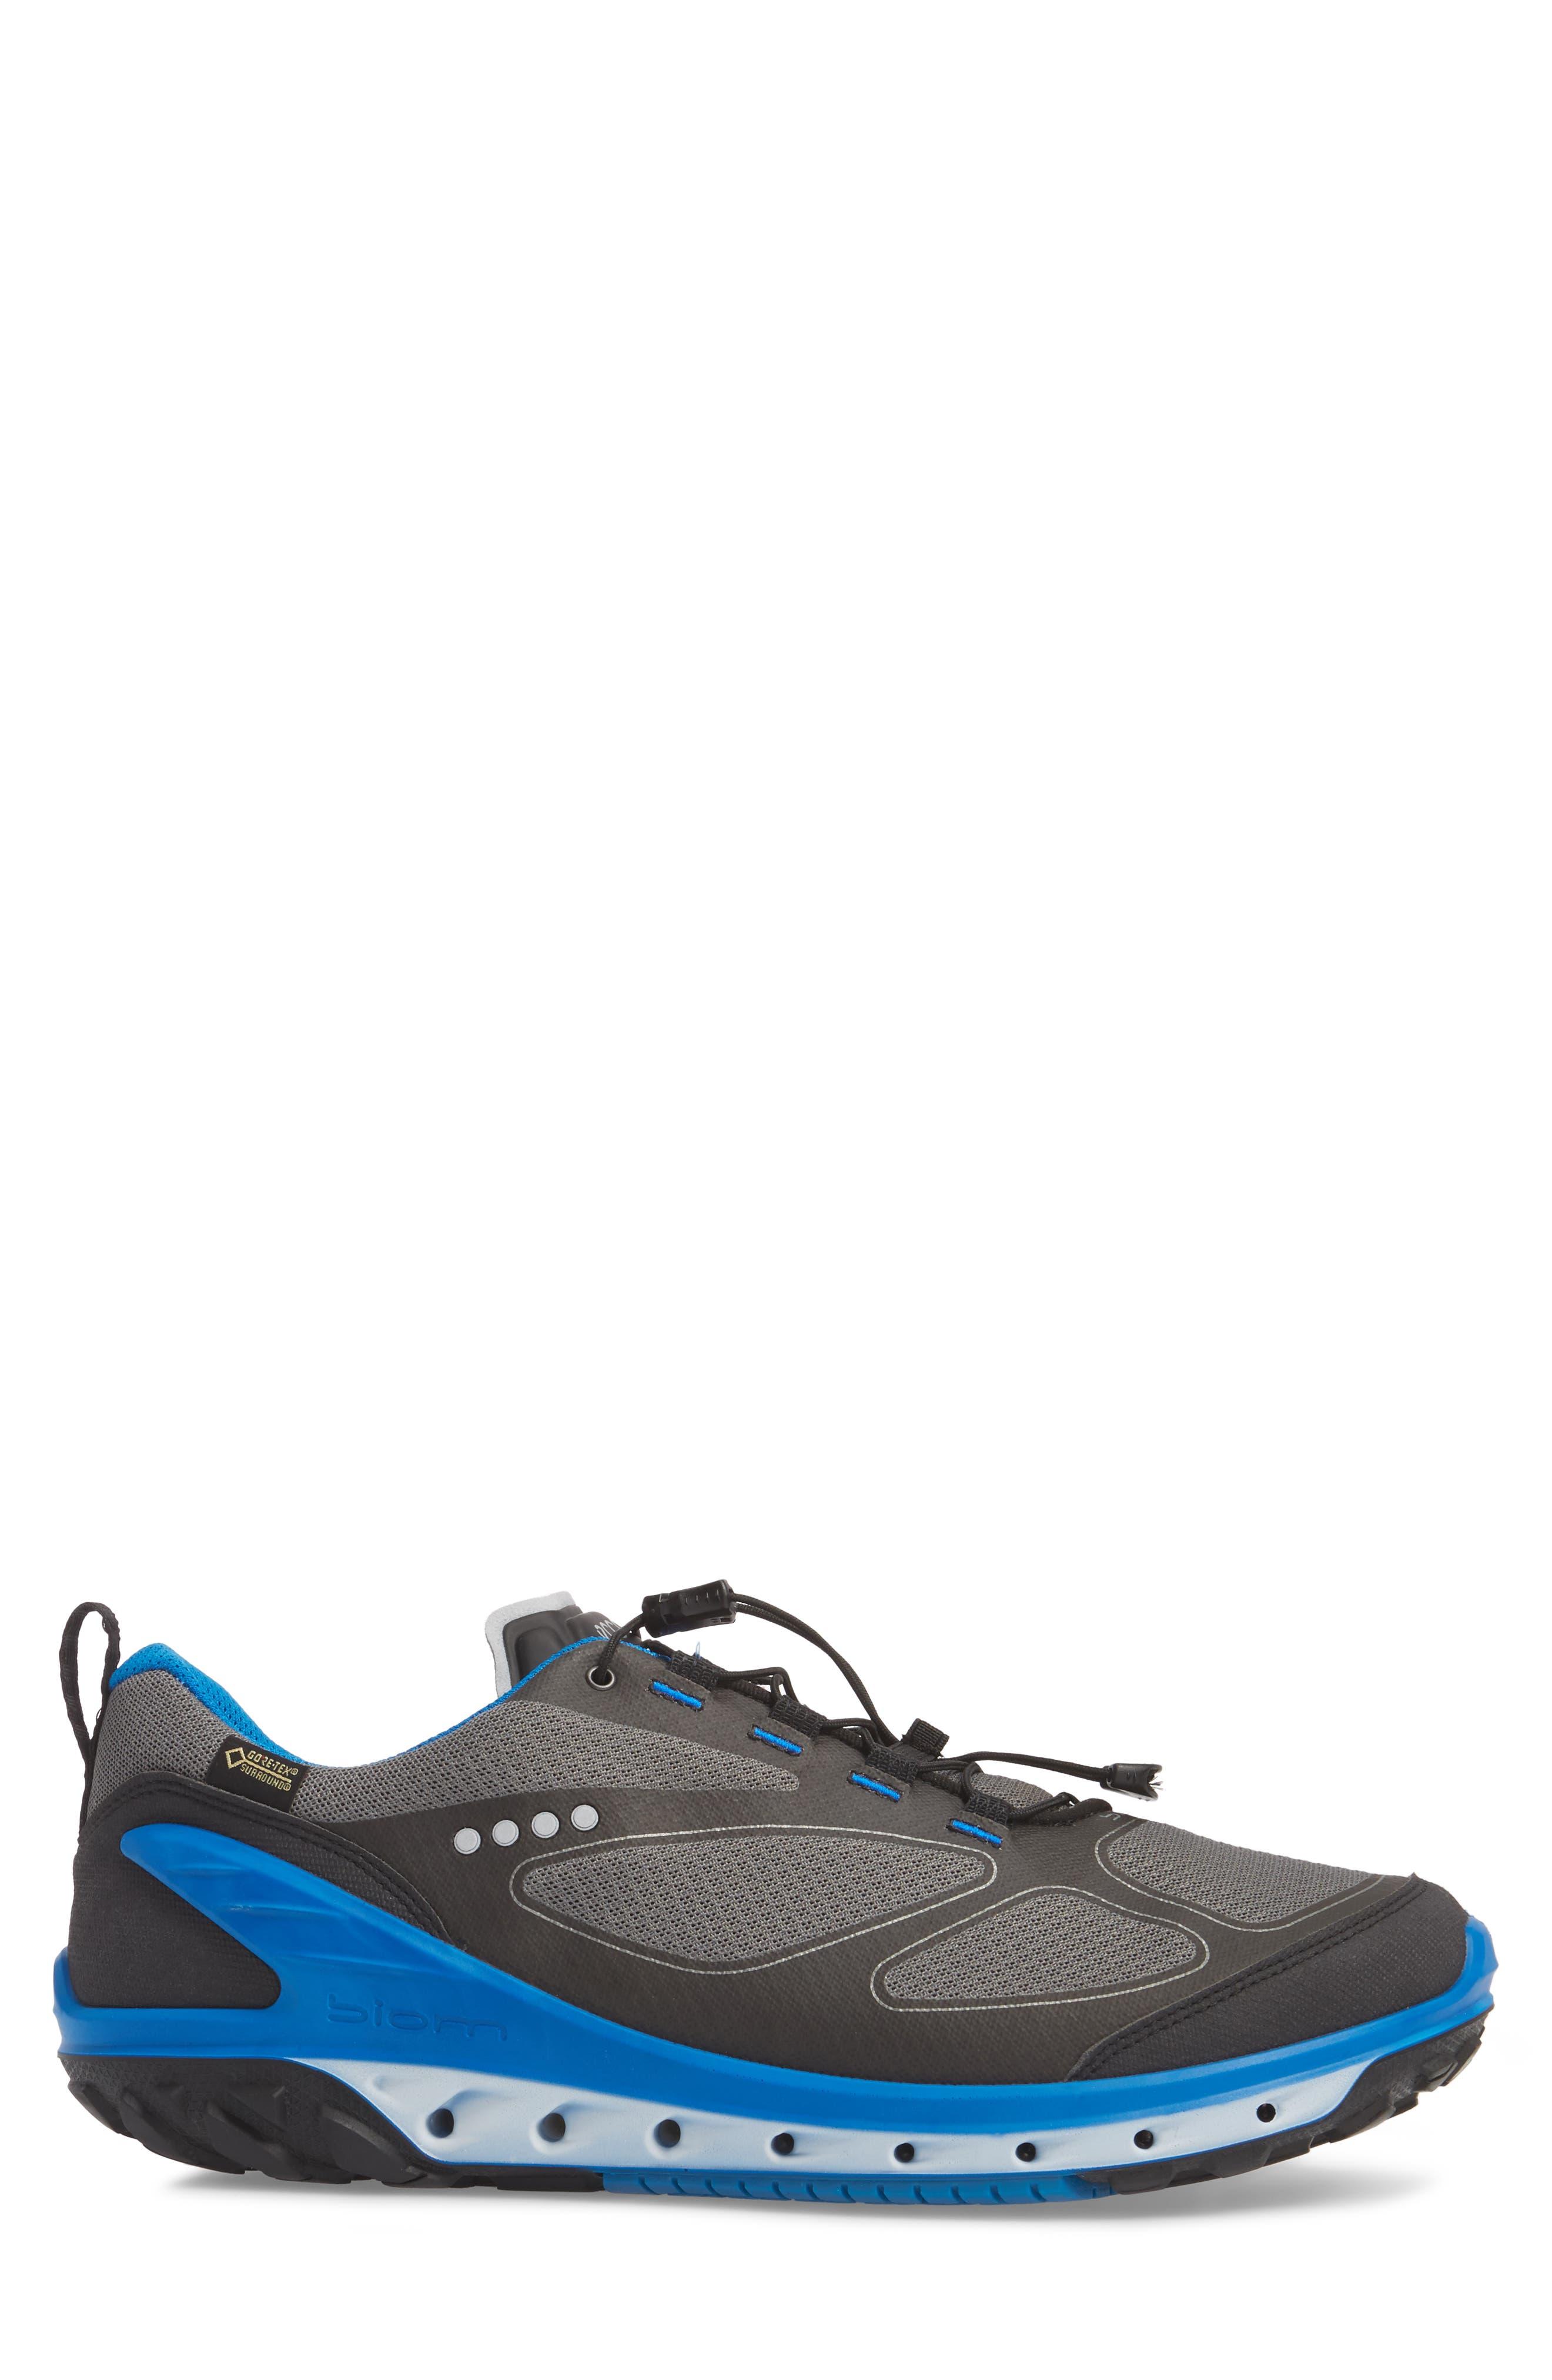 BIOM Venture GTX Sneaker,                             Alternate thumbnail 3, color,                             Black/ Titanium Leather